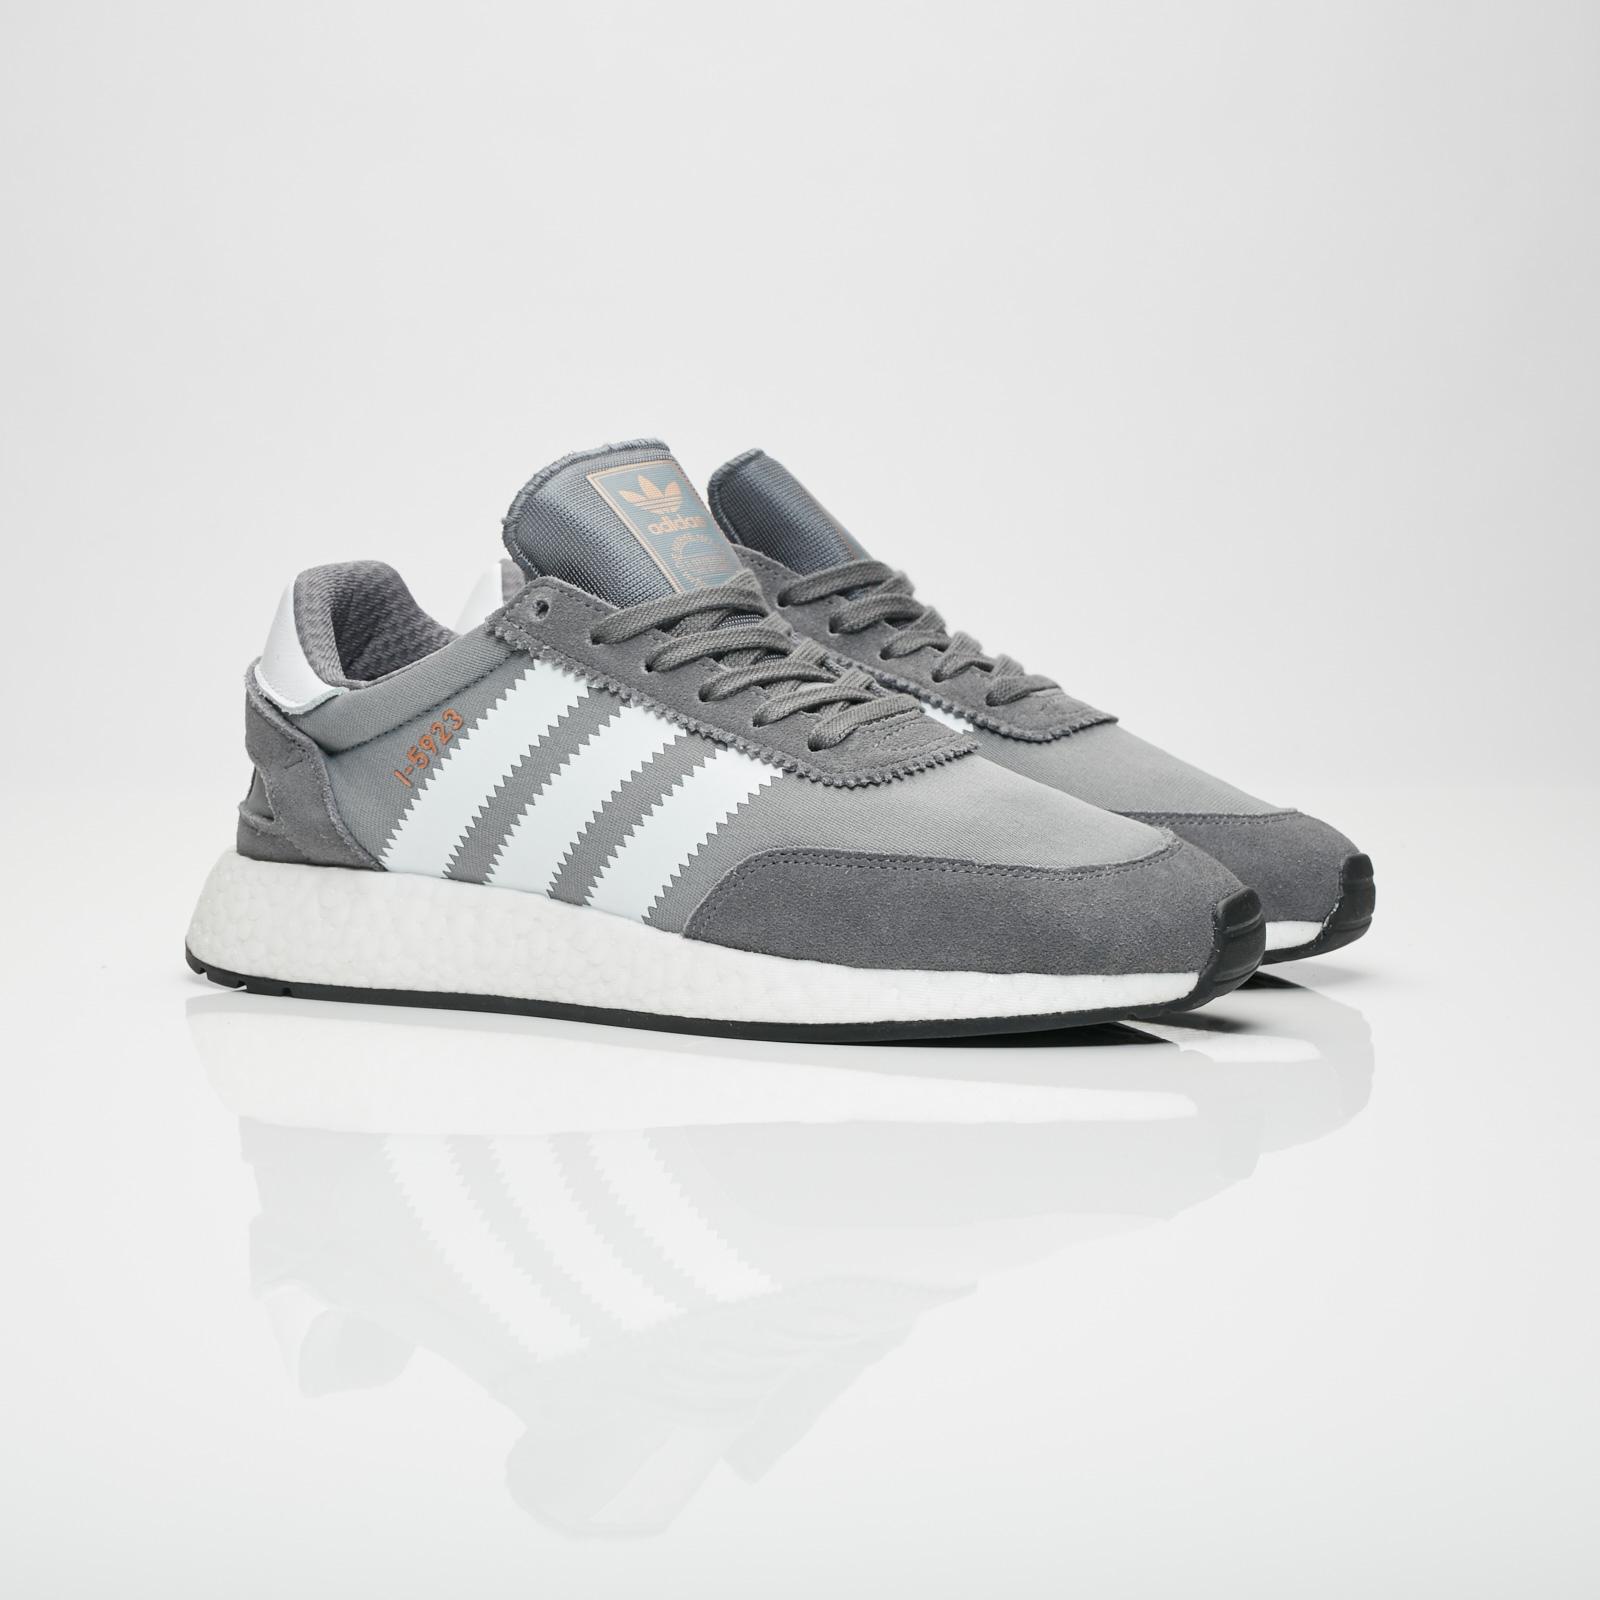 3108807eb adidas I-5923 - Bb2089 - Sneakersnstuff